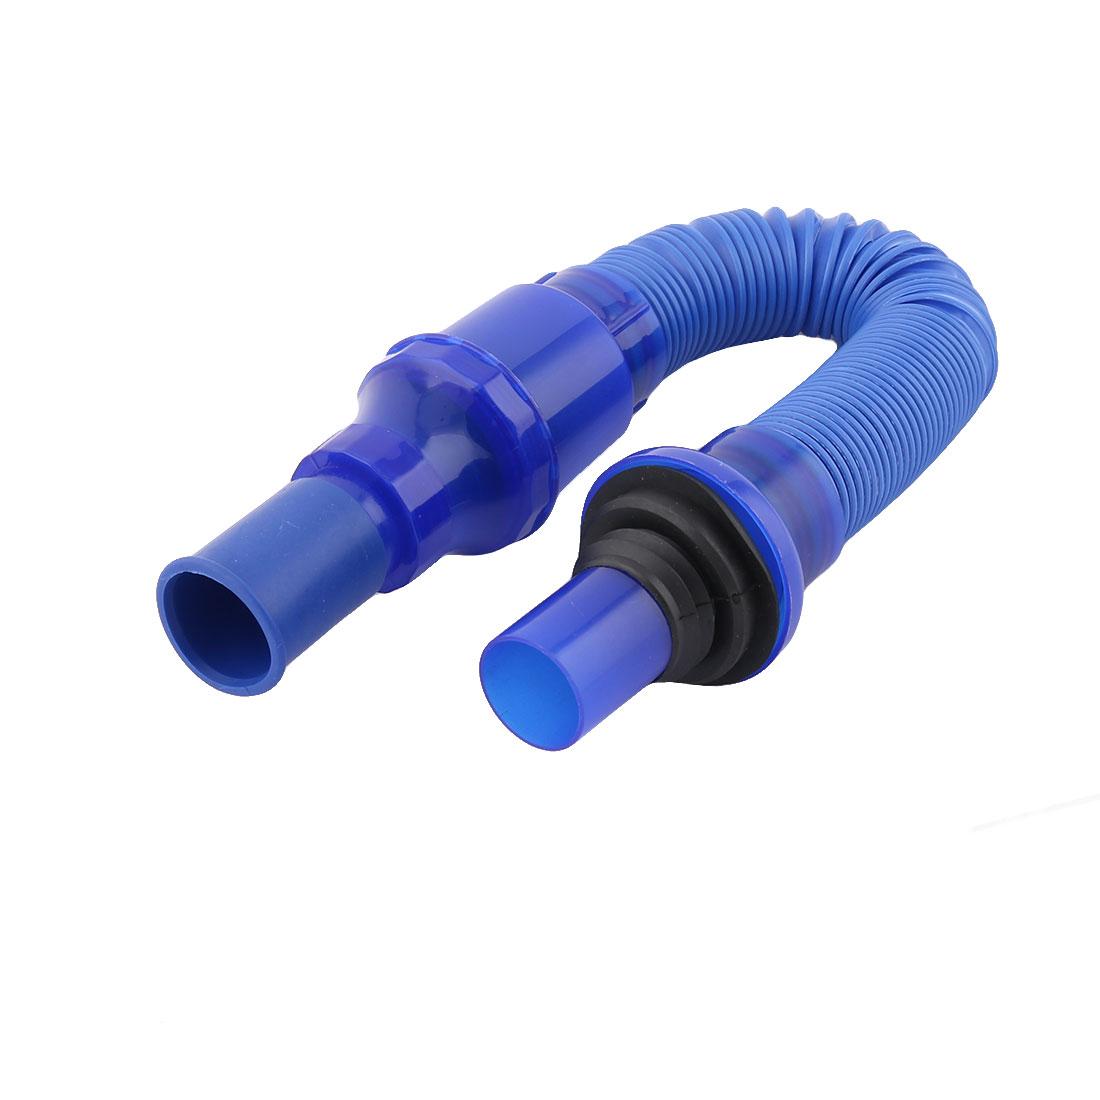 drainage pipe for washing machine